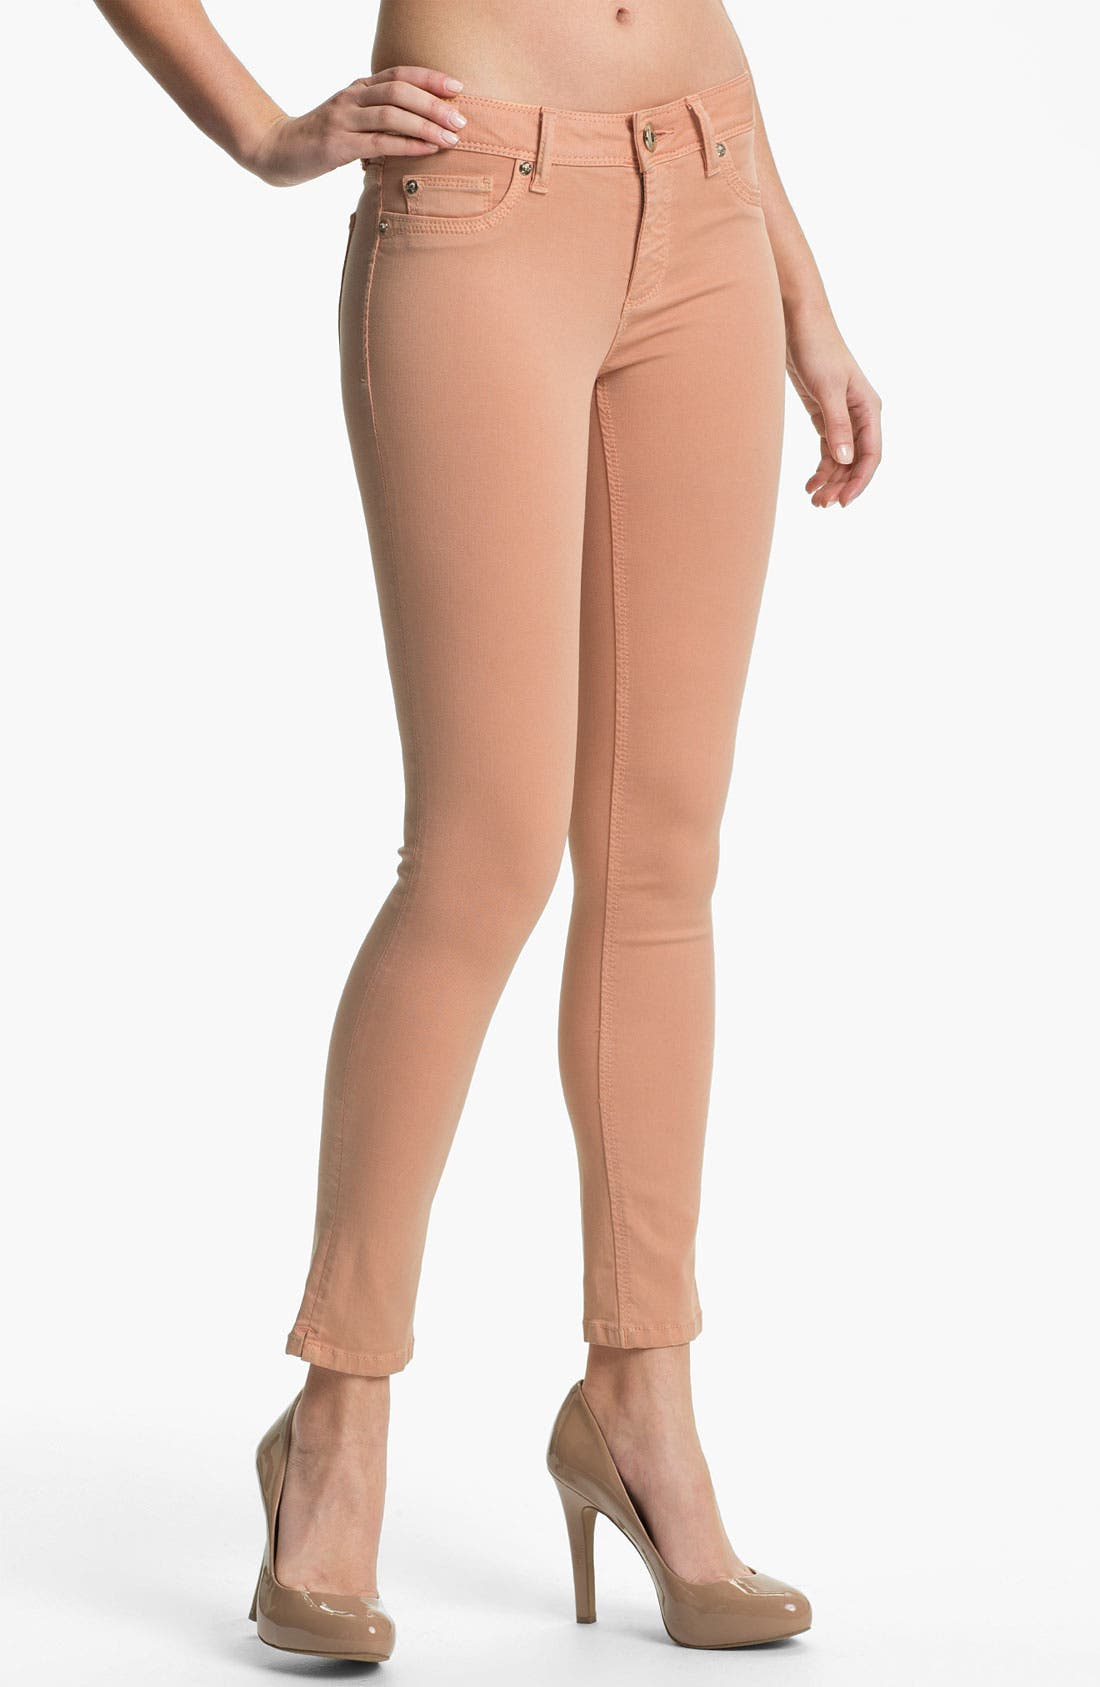 Main Image - DL1961 'Angel' X-Fit Stretch Denim Skinny Ankle Jeans (Nice)